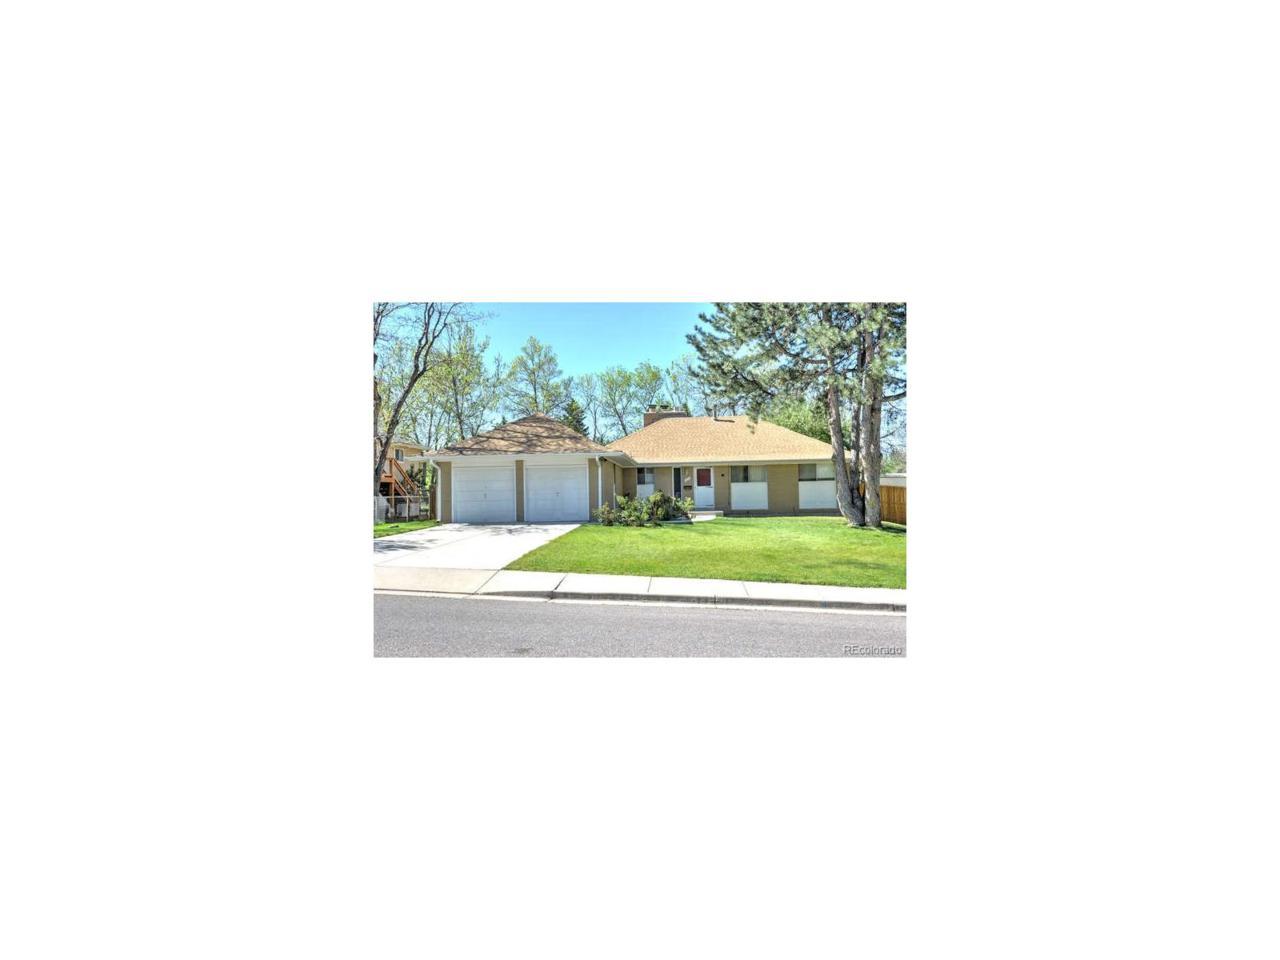 304 W Fremont Avenue, Littleton, CO 80120 (MLS #2489173) :: 8z Real Estate